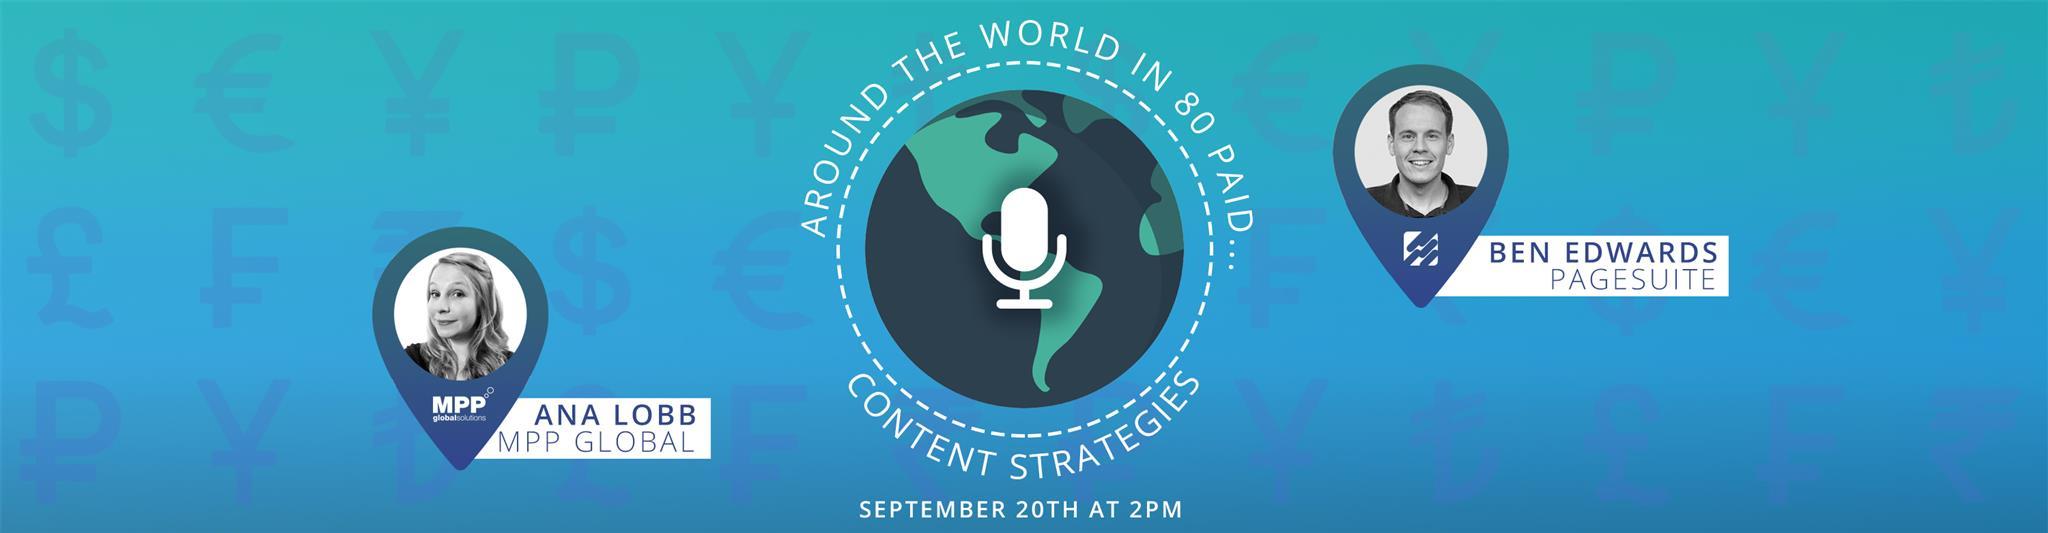 WEBINAR: Around the World in 80 Paid…Content Strategies